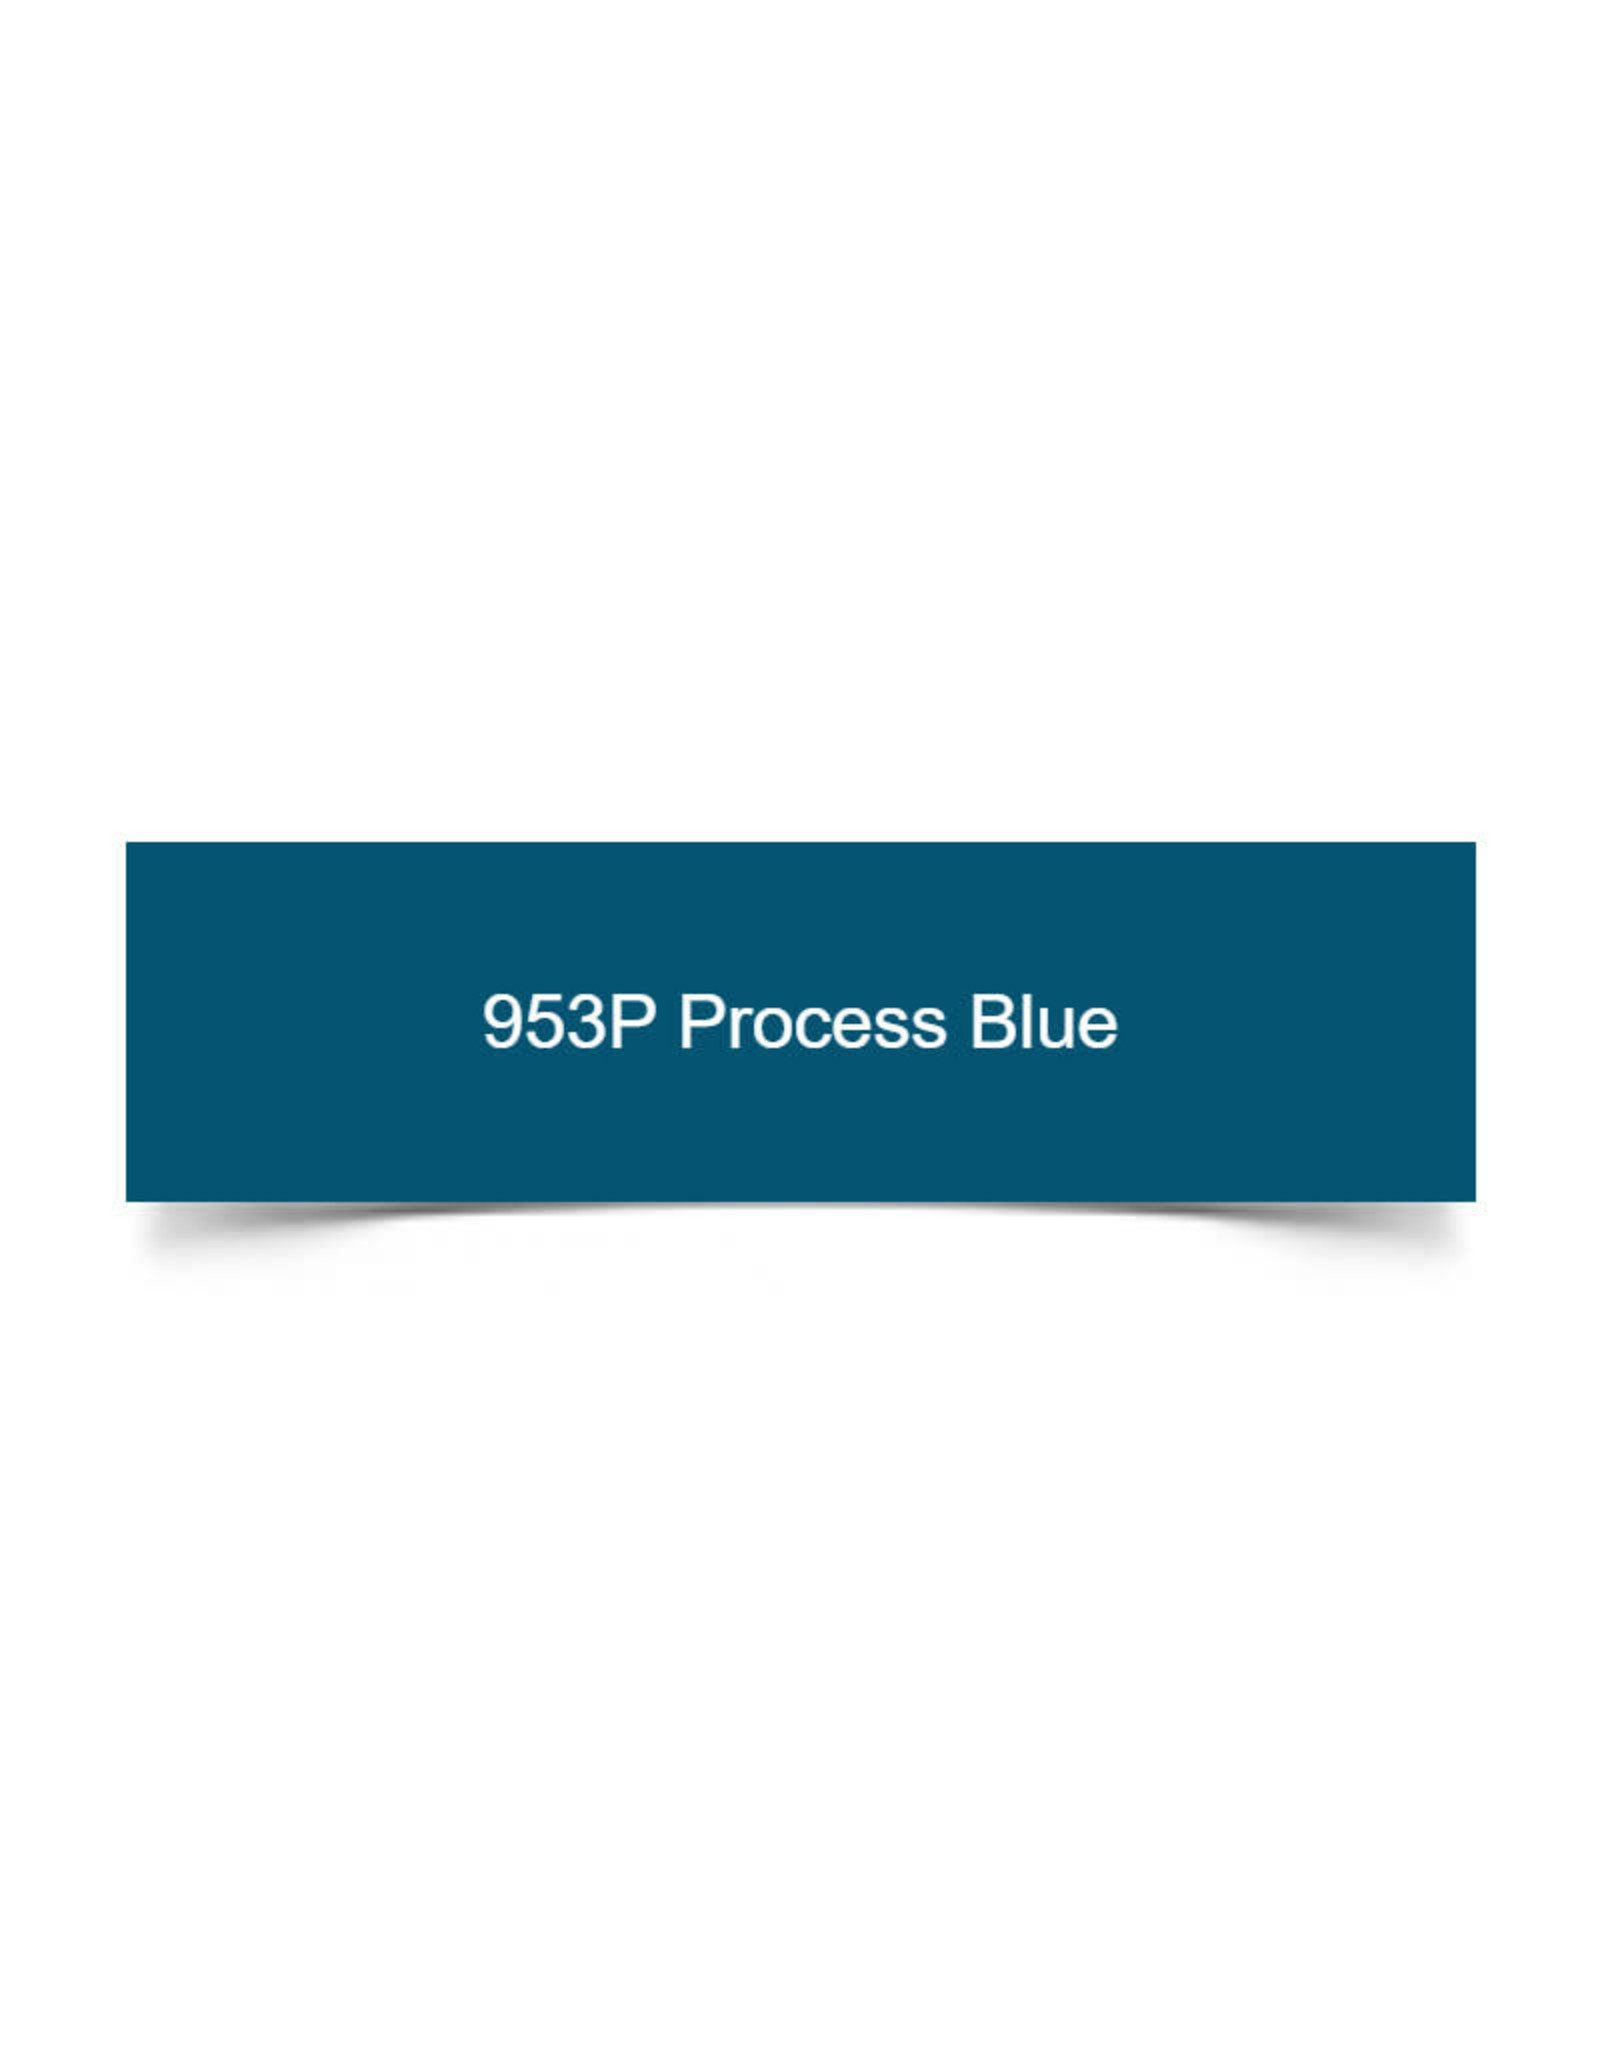 1 Shot 1 Shot Pearlescent Enamels 237 ml - 953P Process Blue